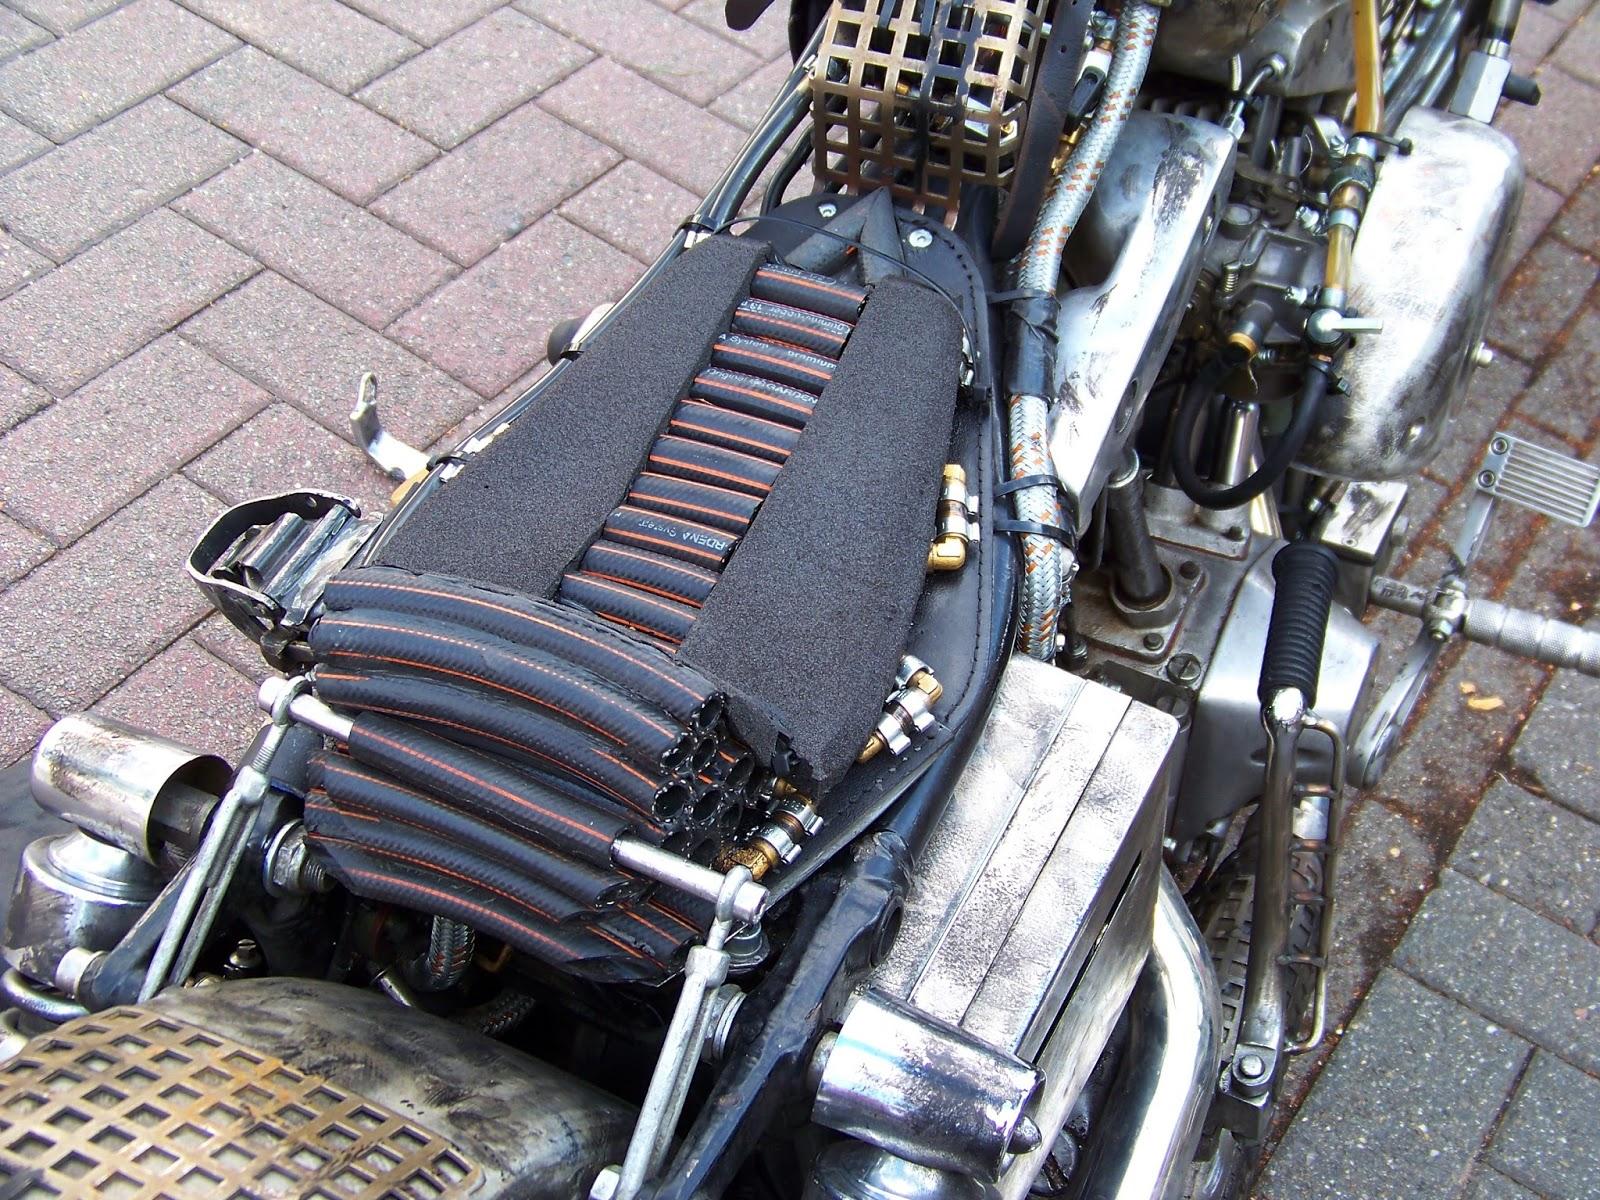 Harley Davidson steampunk ratchopper - Motorcycle Style